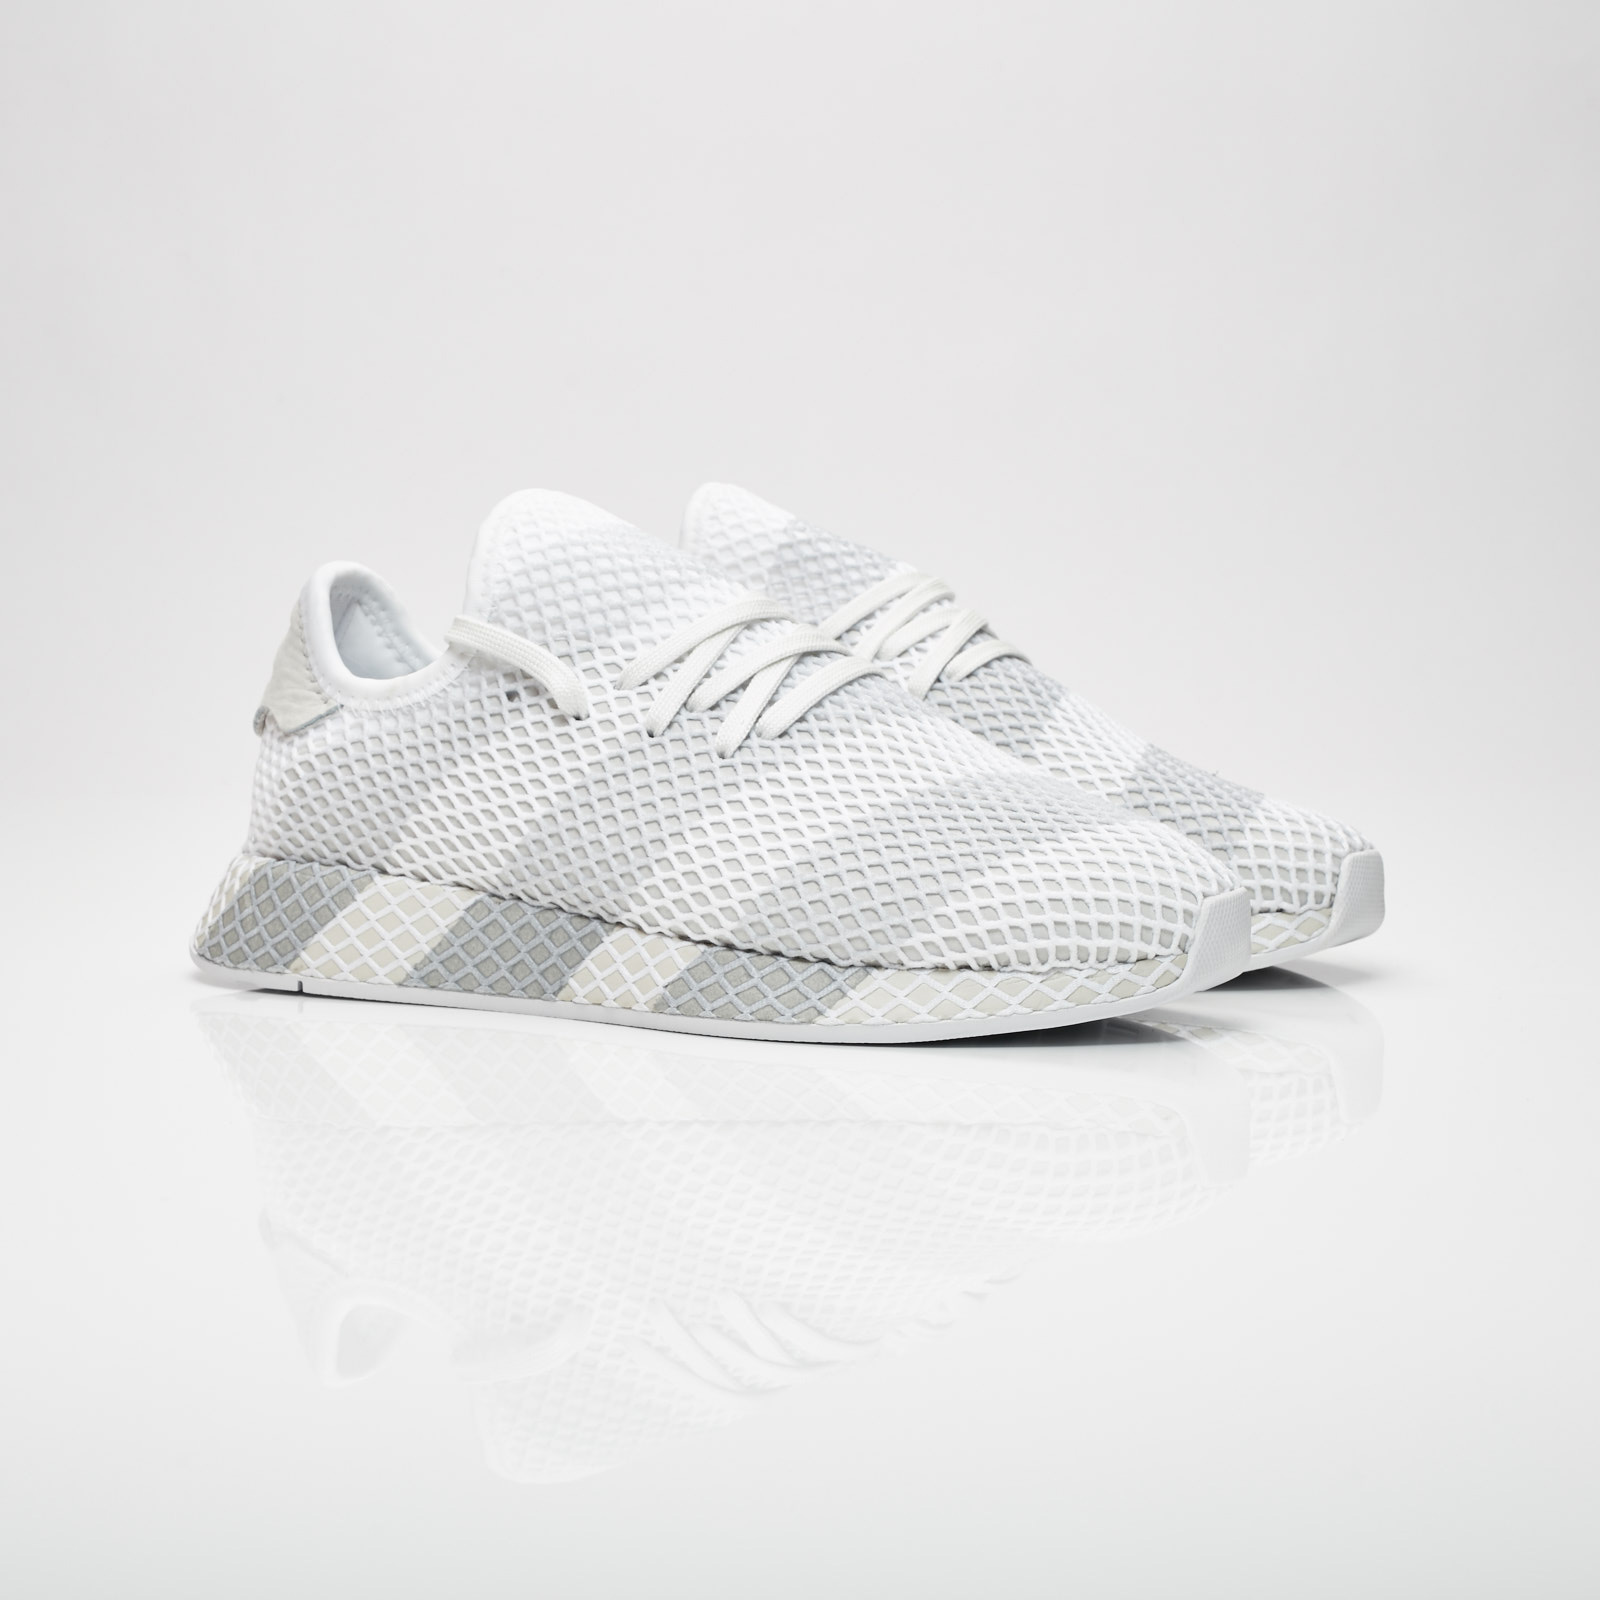 941f125a1bb adidas Deerupt Consortium - Ac7755 - Sneakersnstuff